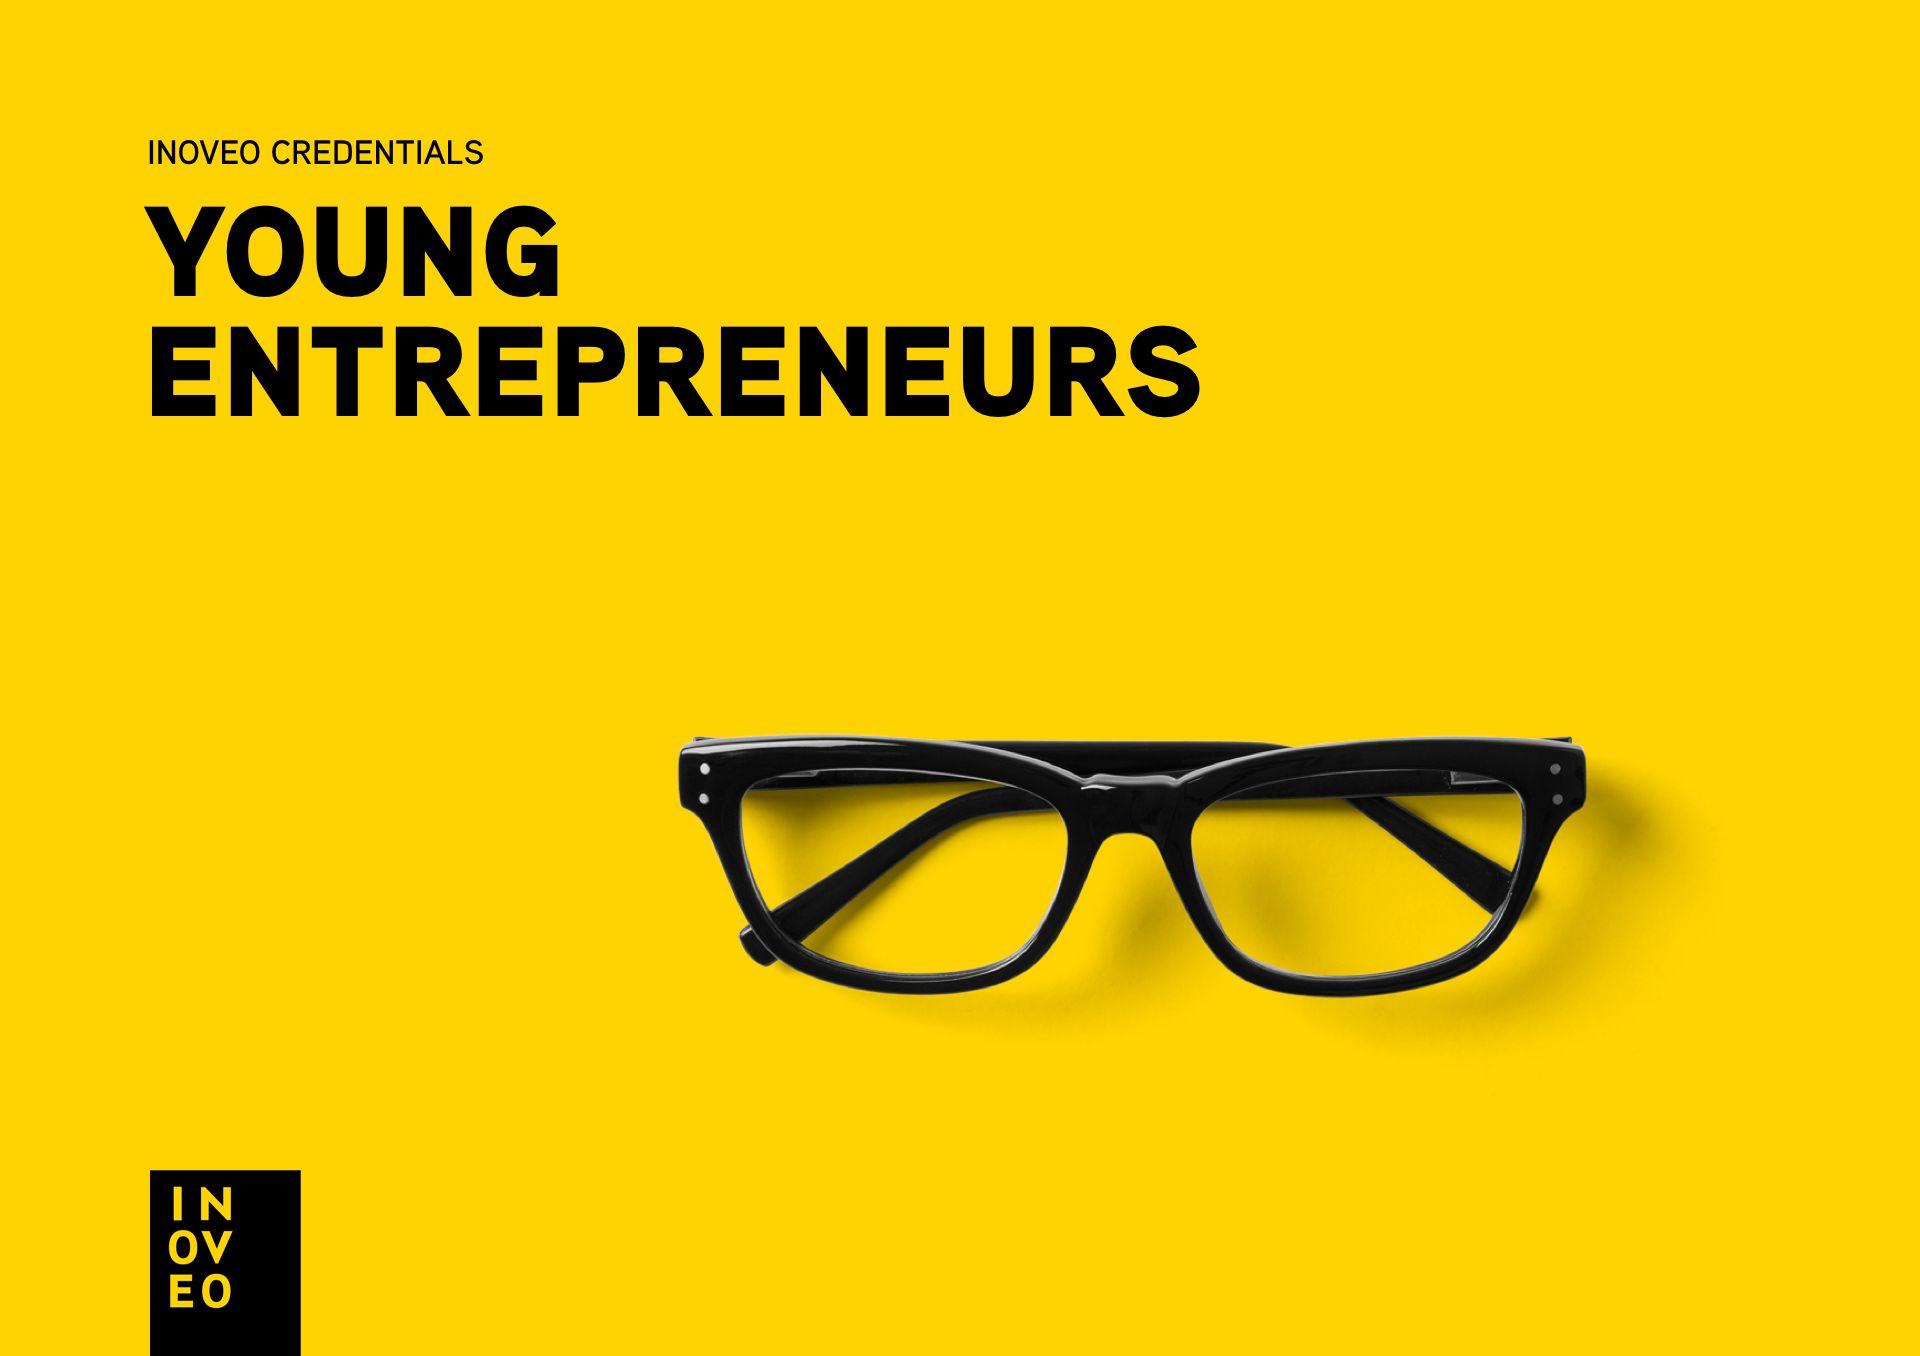 Young Entrepreneurs credentials INOVEO branding